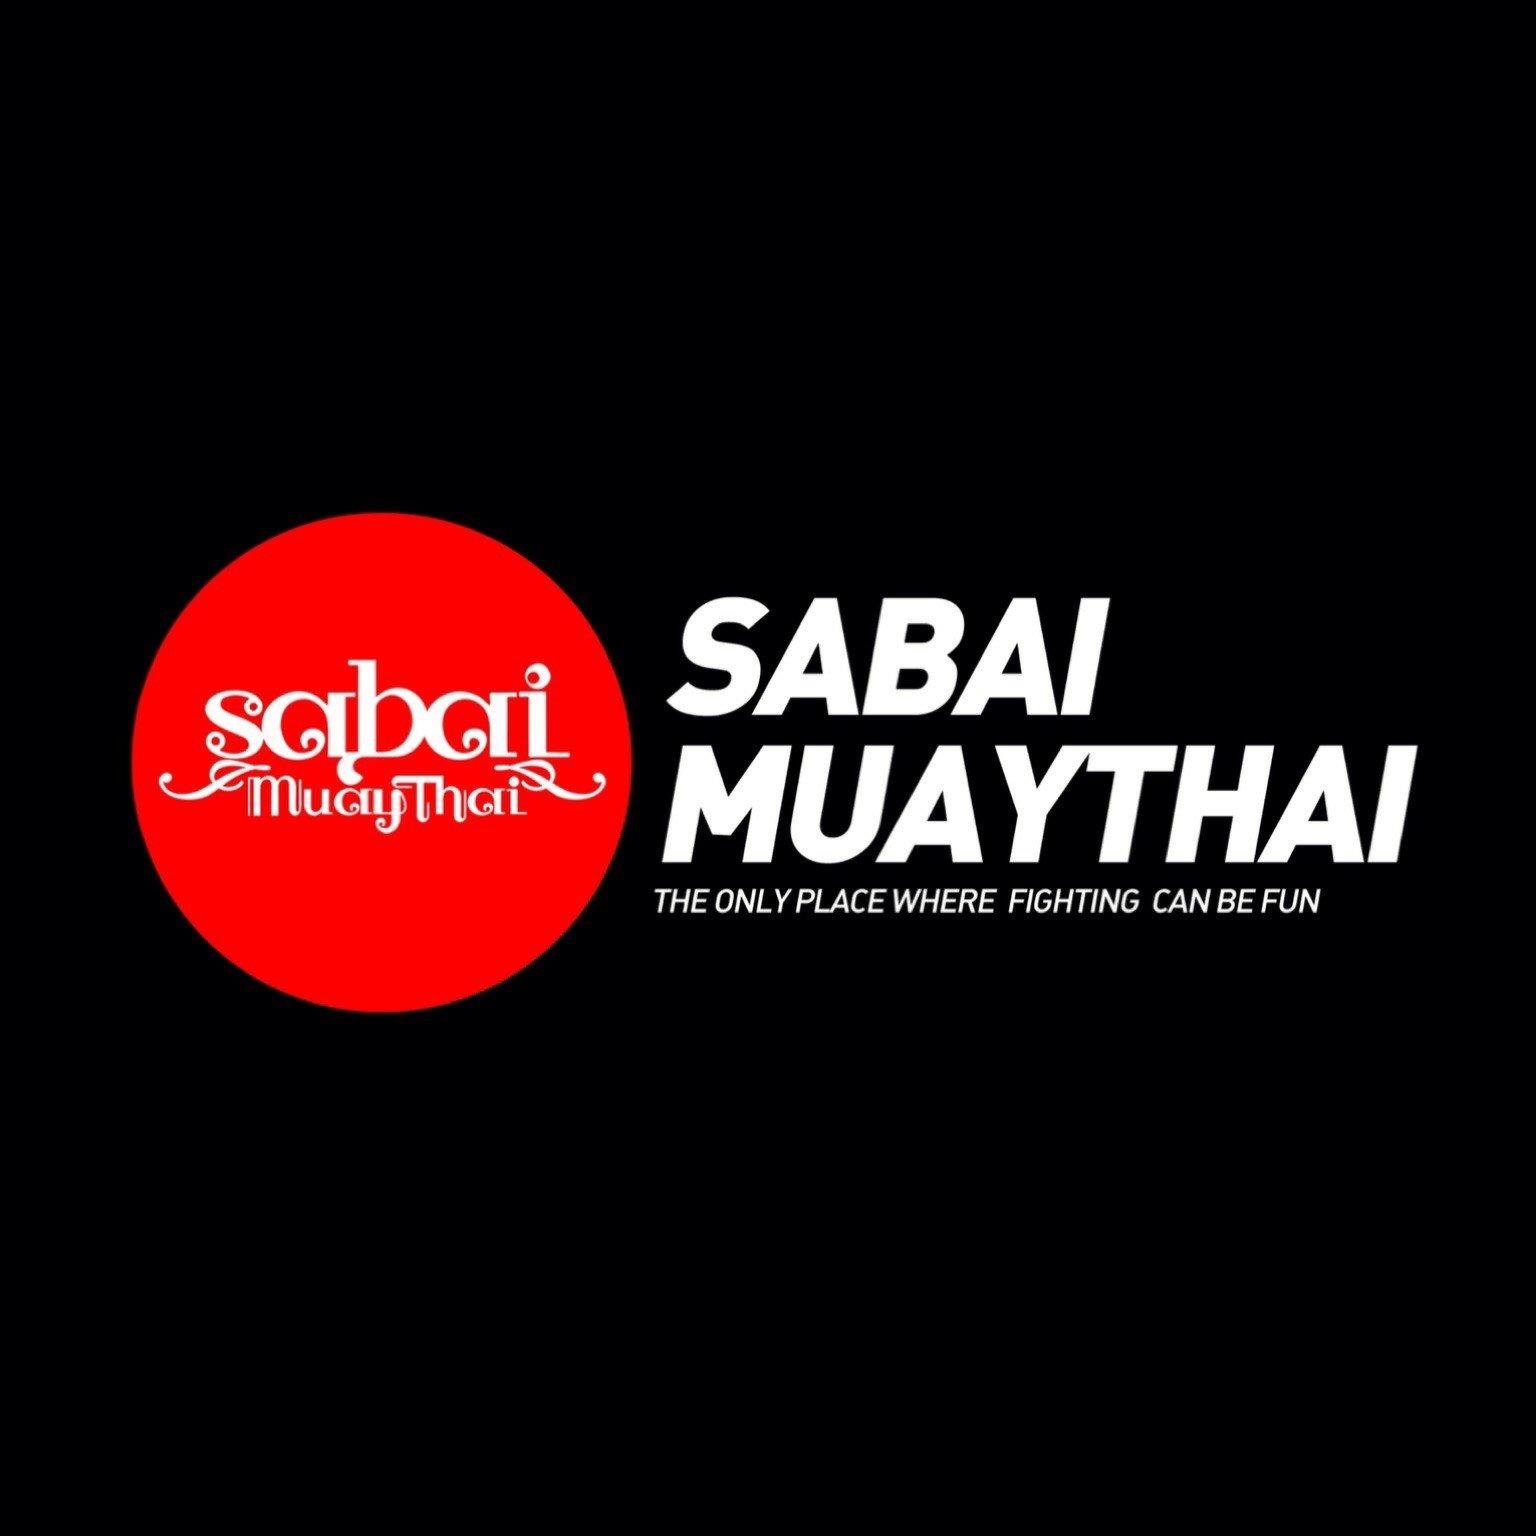 Sabai Muaythai